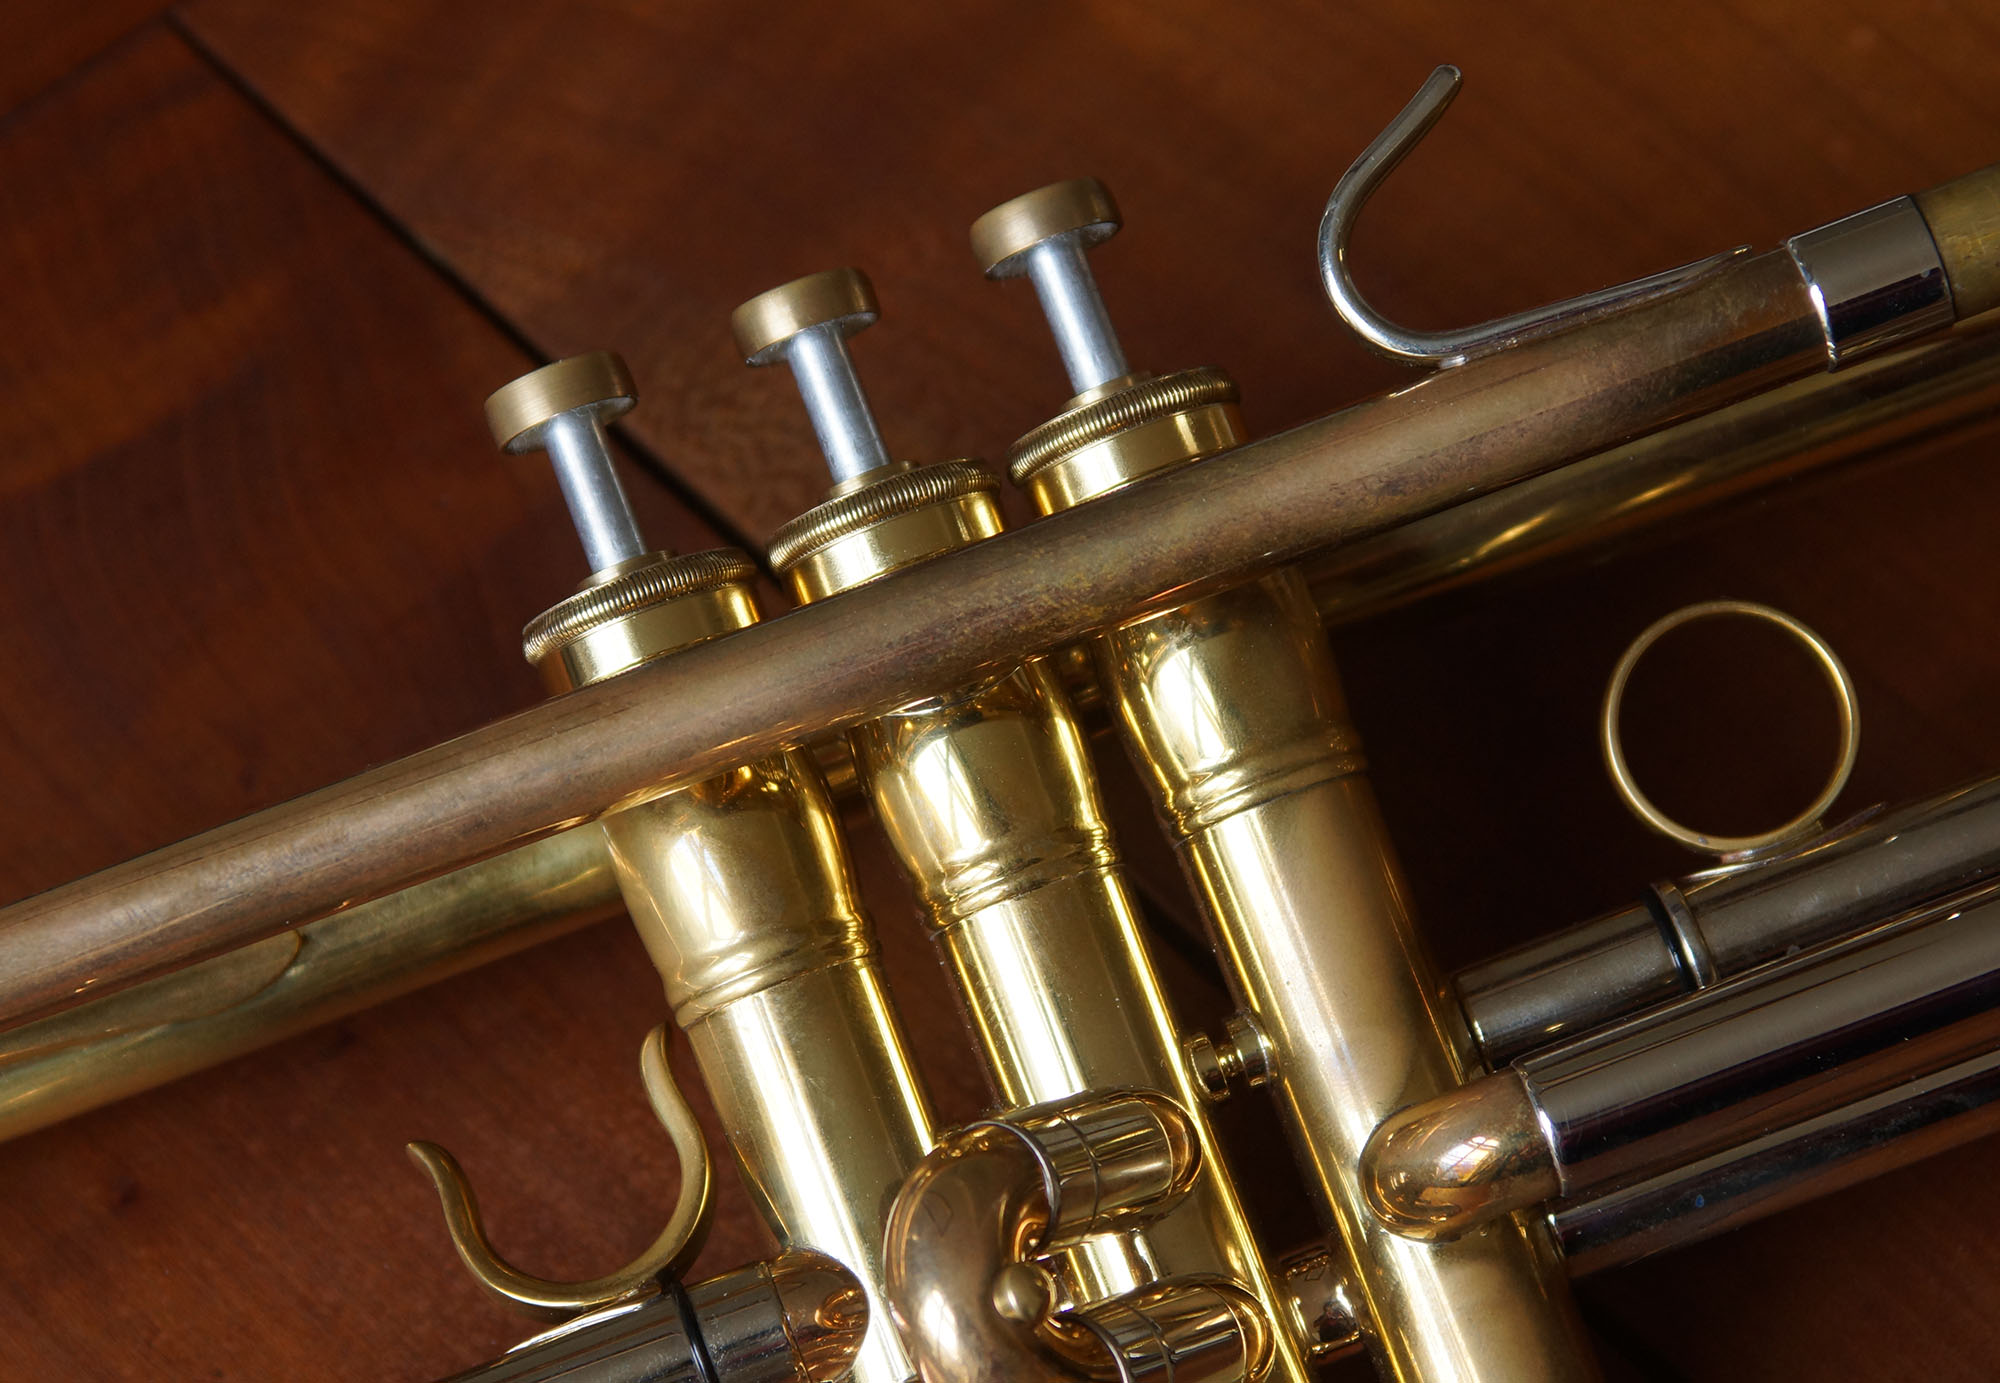 TrumpetScout_Trompete entlacken_2